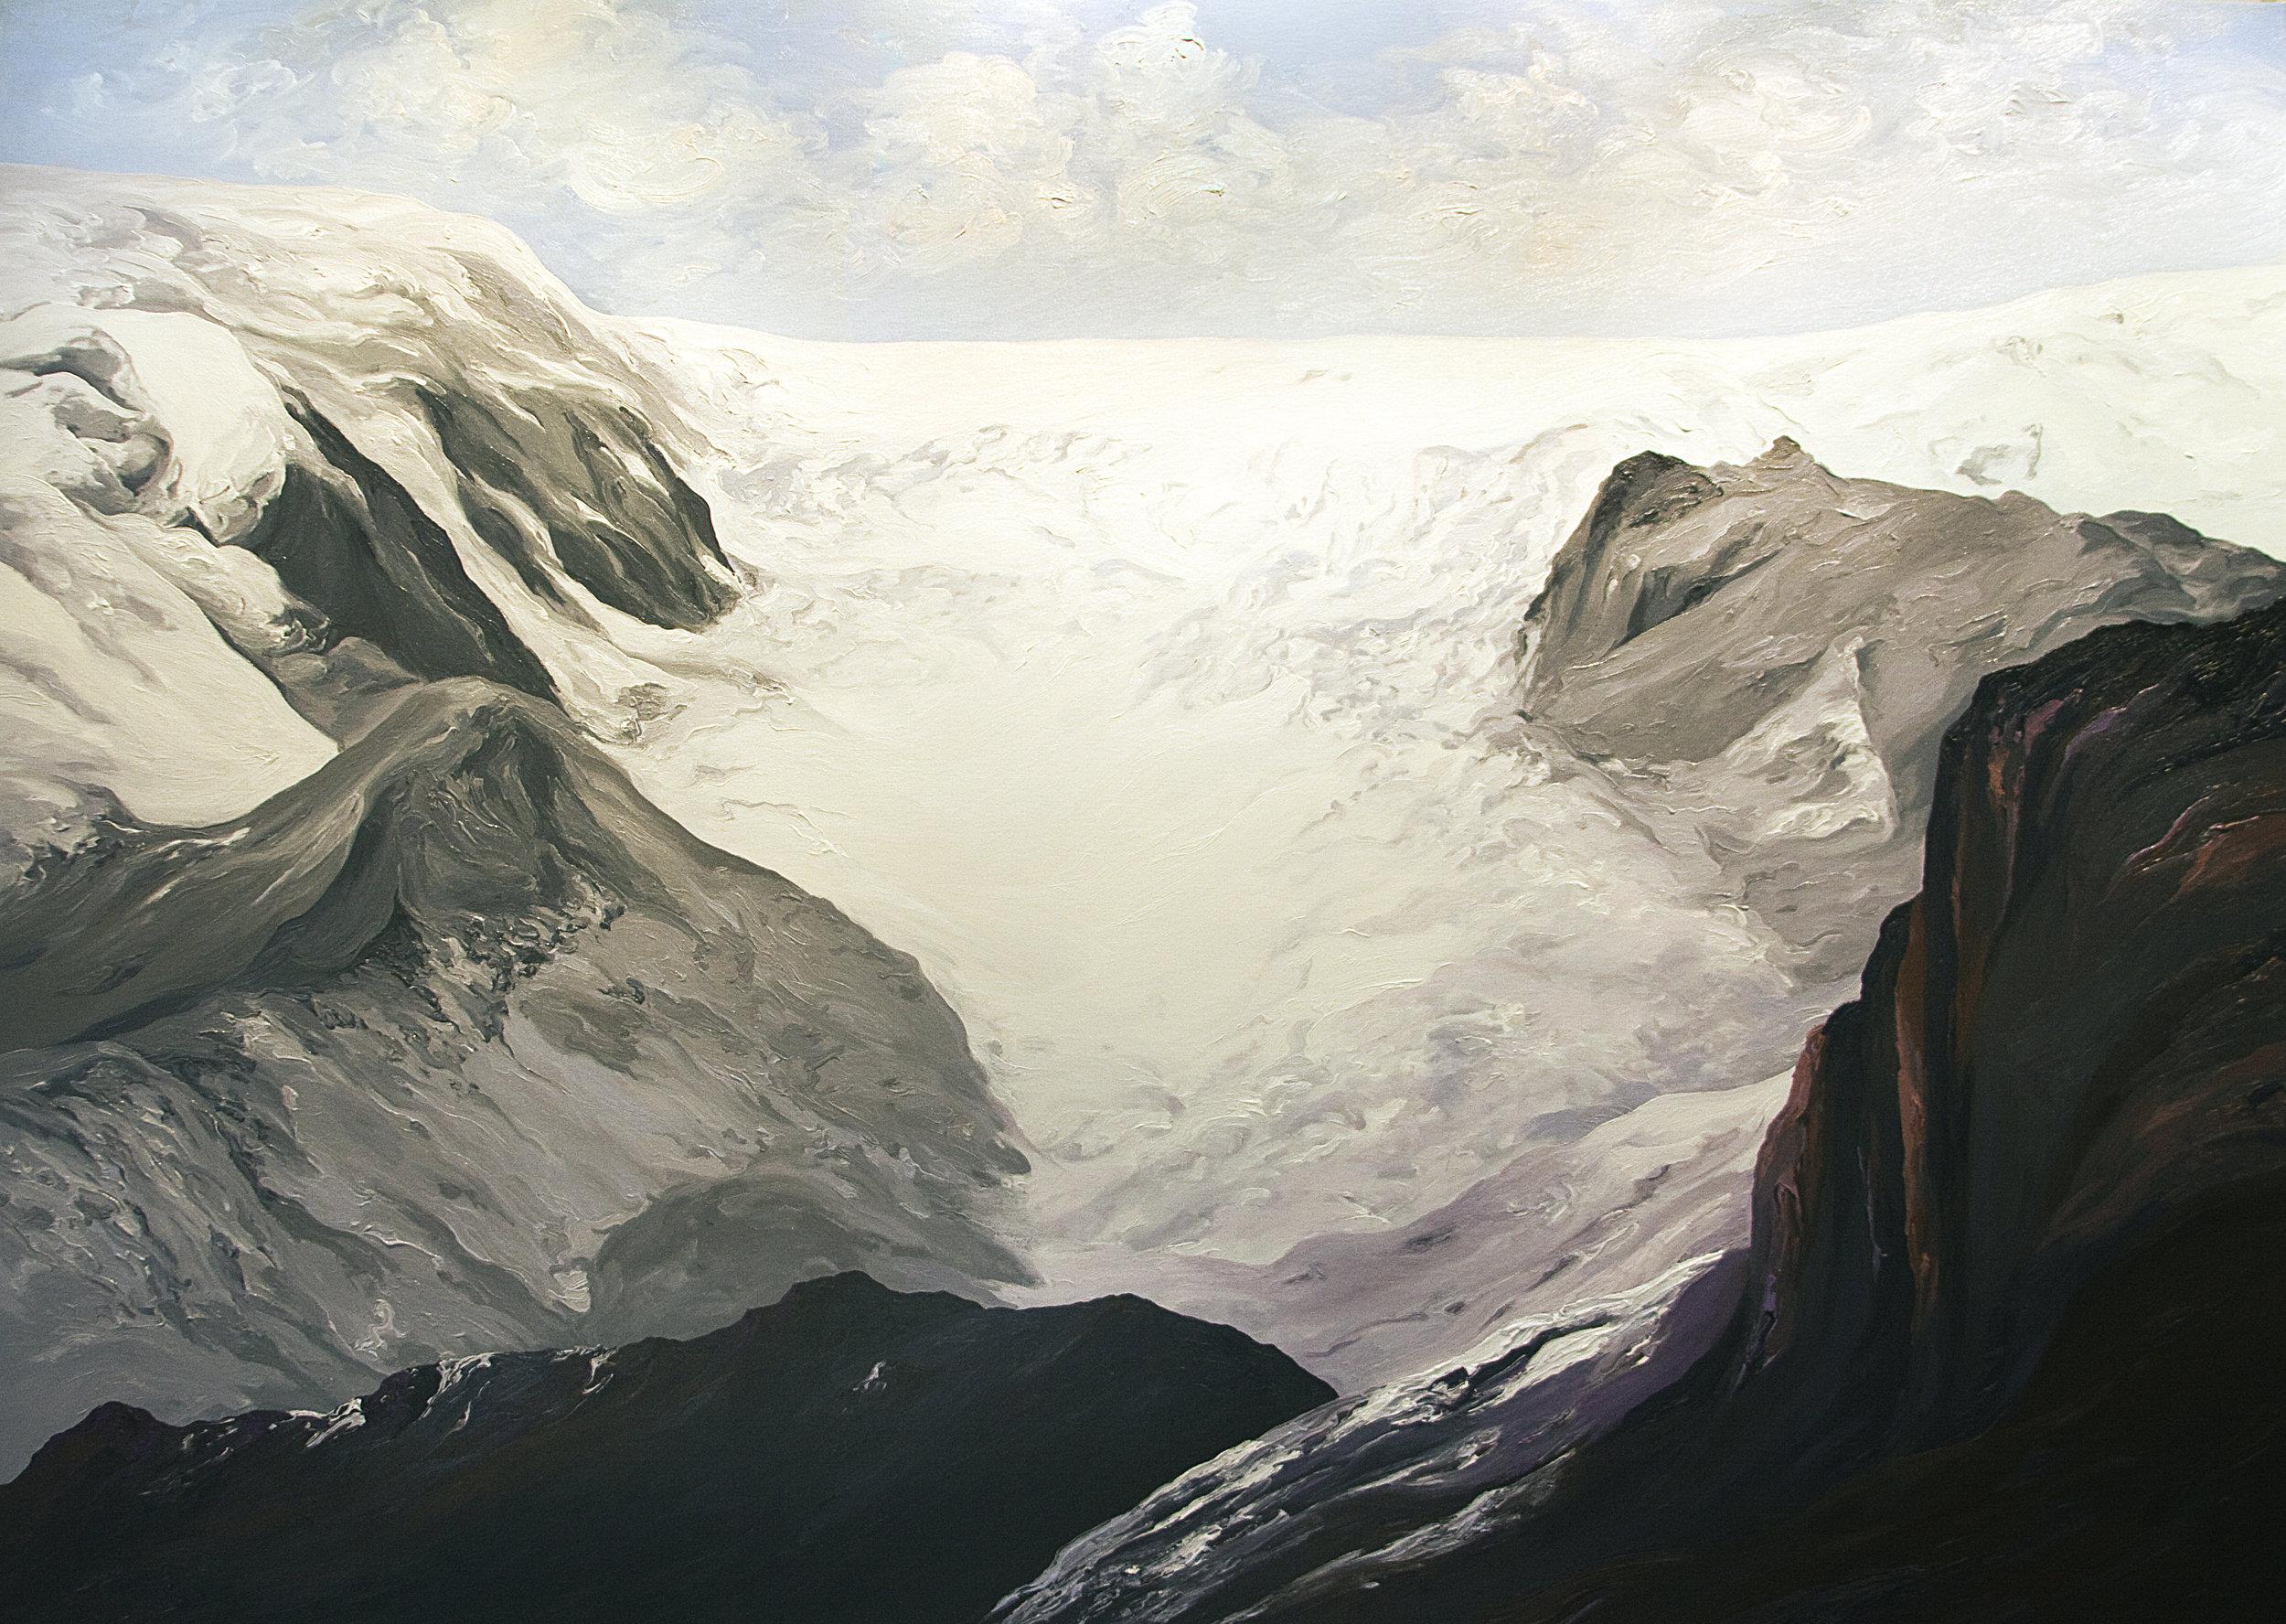 Qori Kalis Glacier #3, 1983, after Henry Brecher